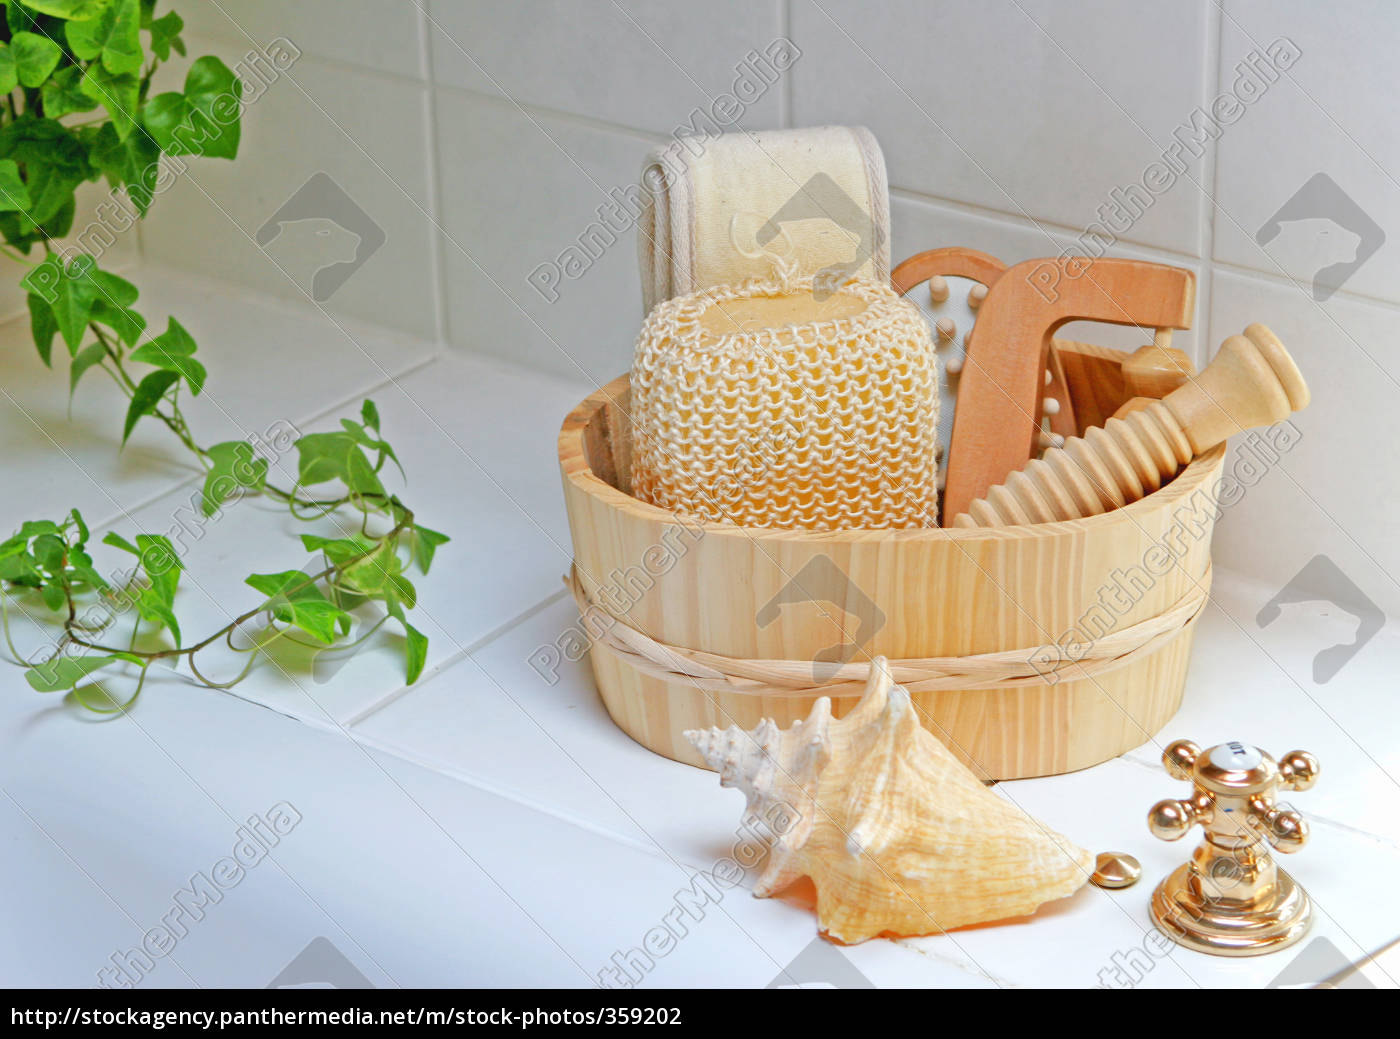 wellness, basket - 359202